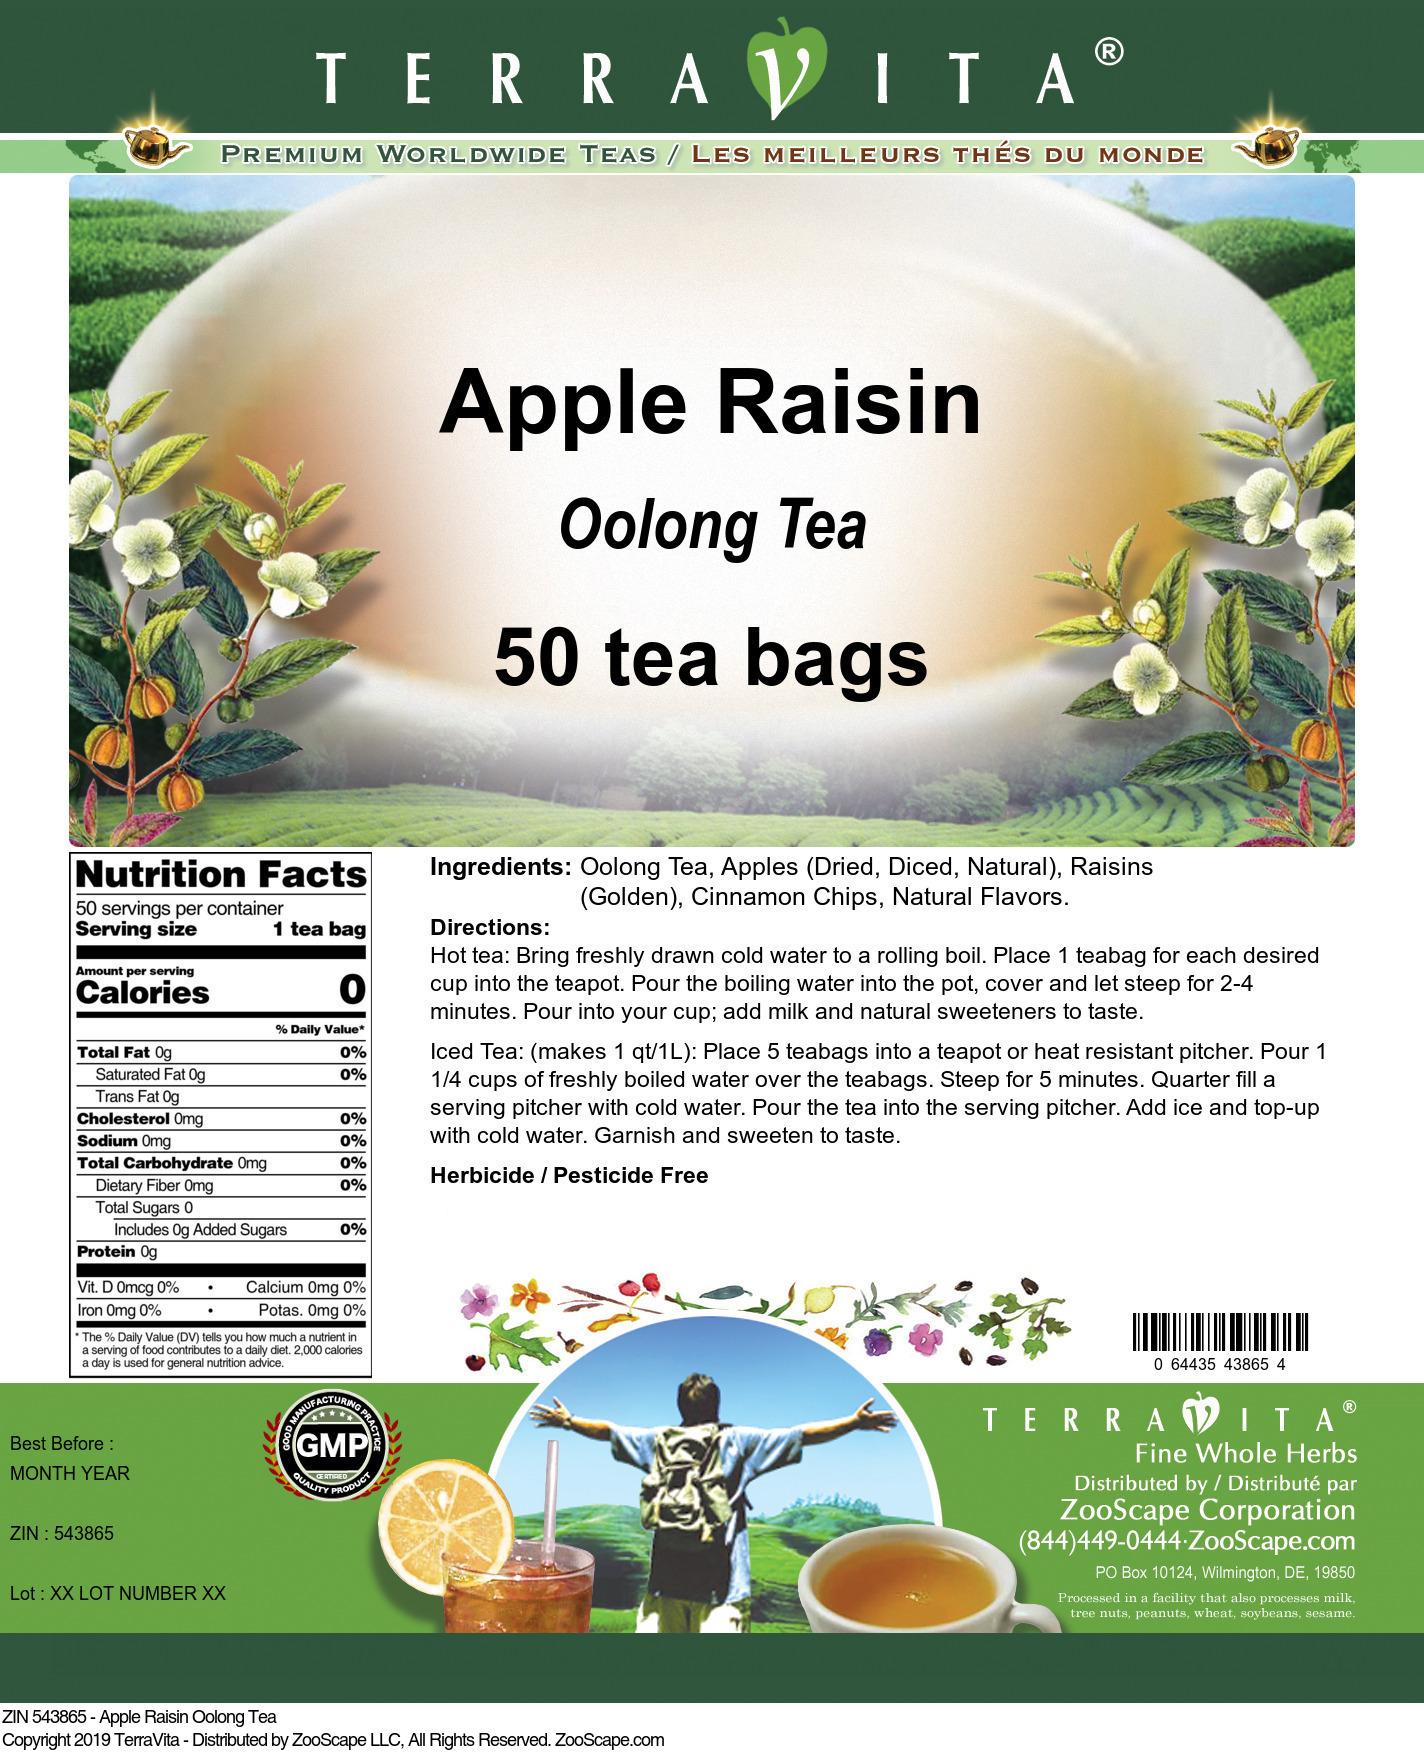 Apple Raisin Oolong Tea